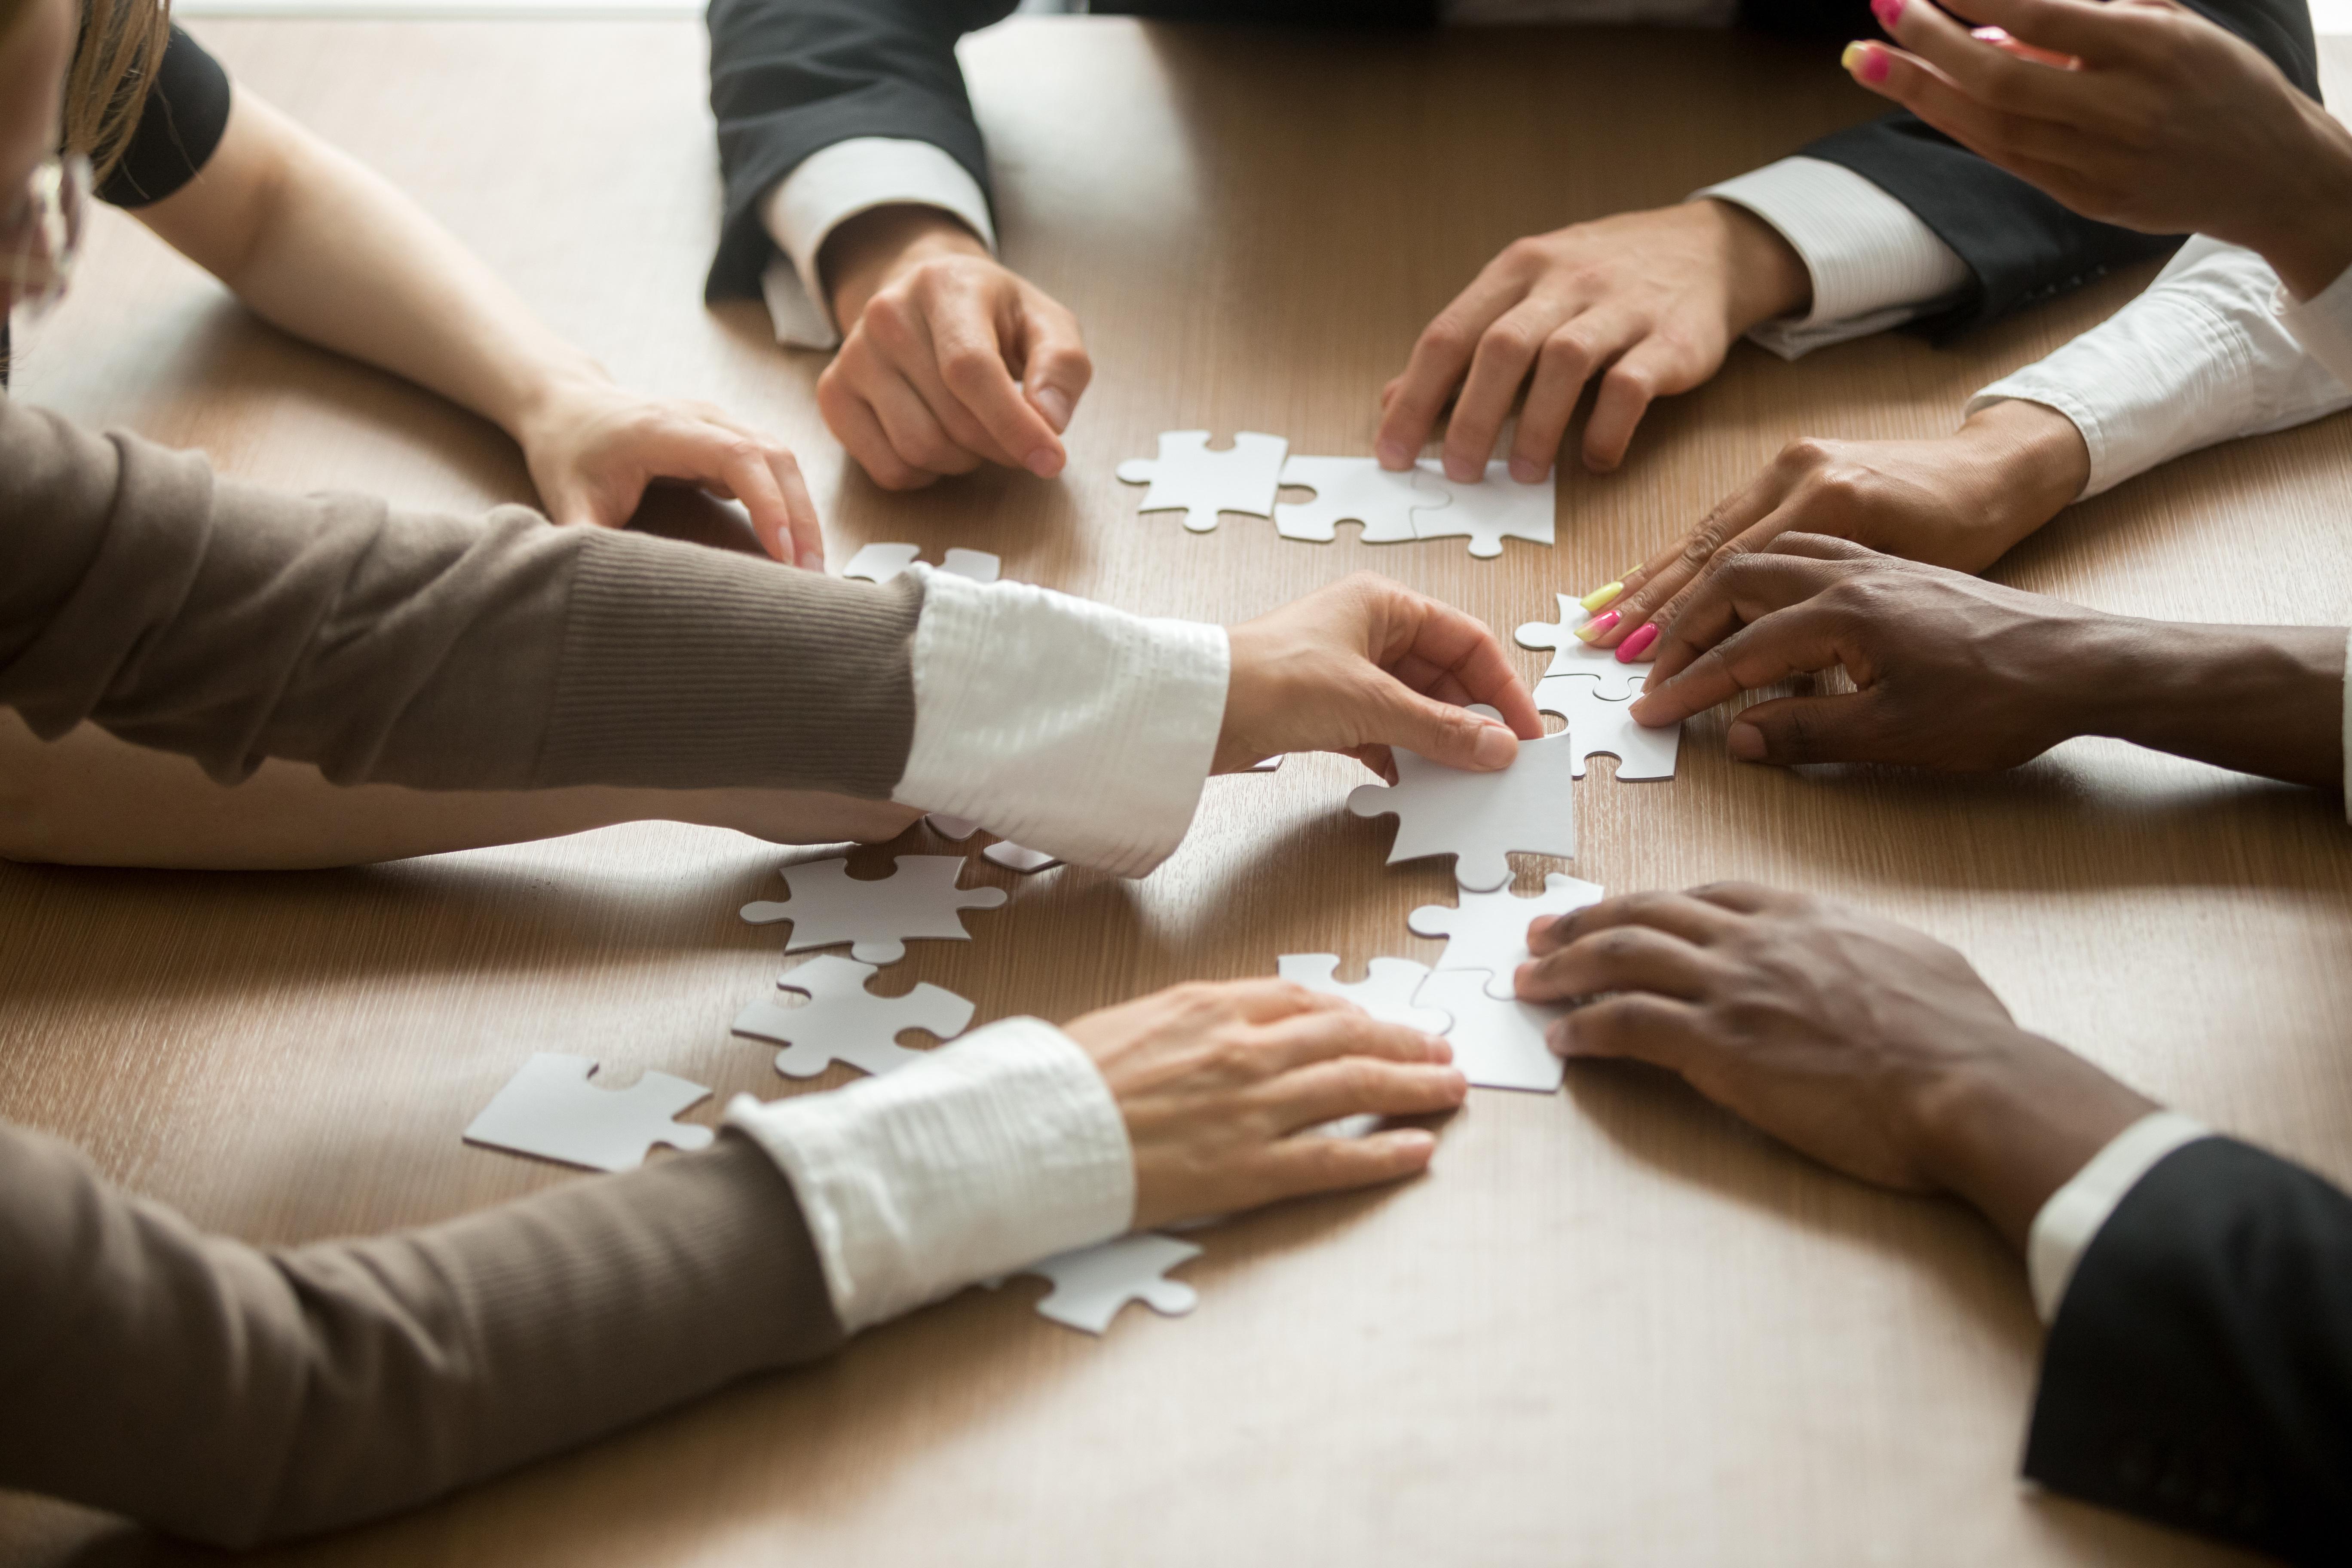 Teamwork-Puzzle